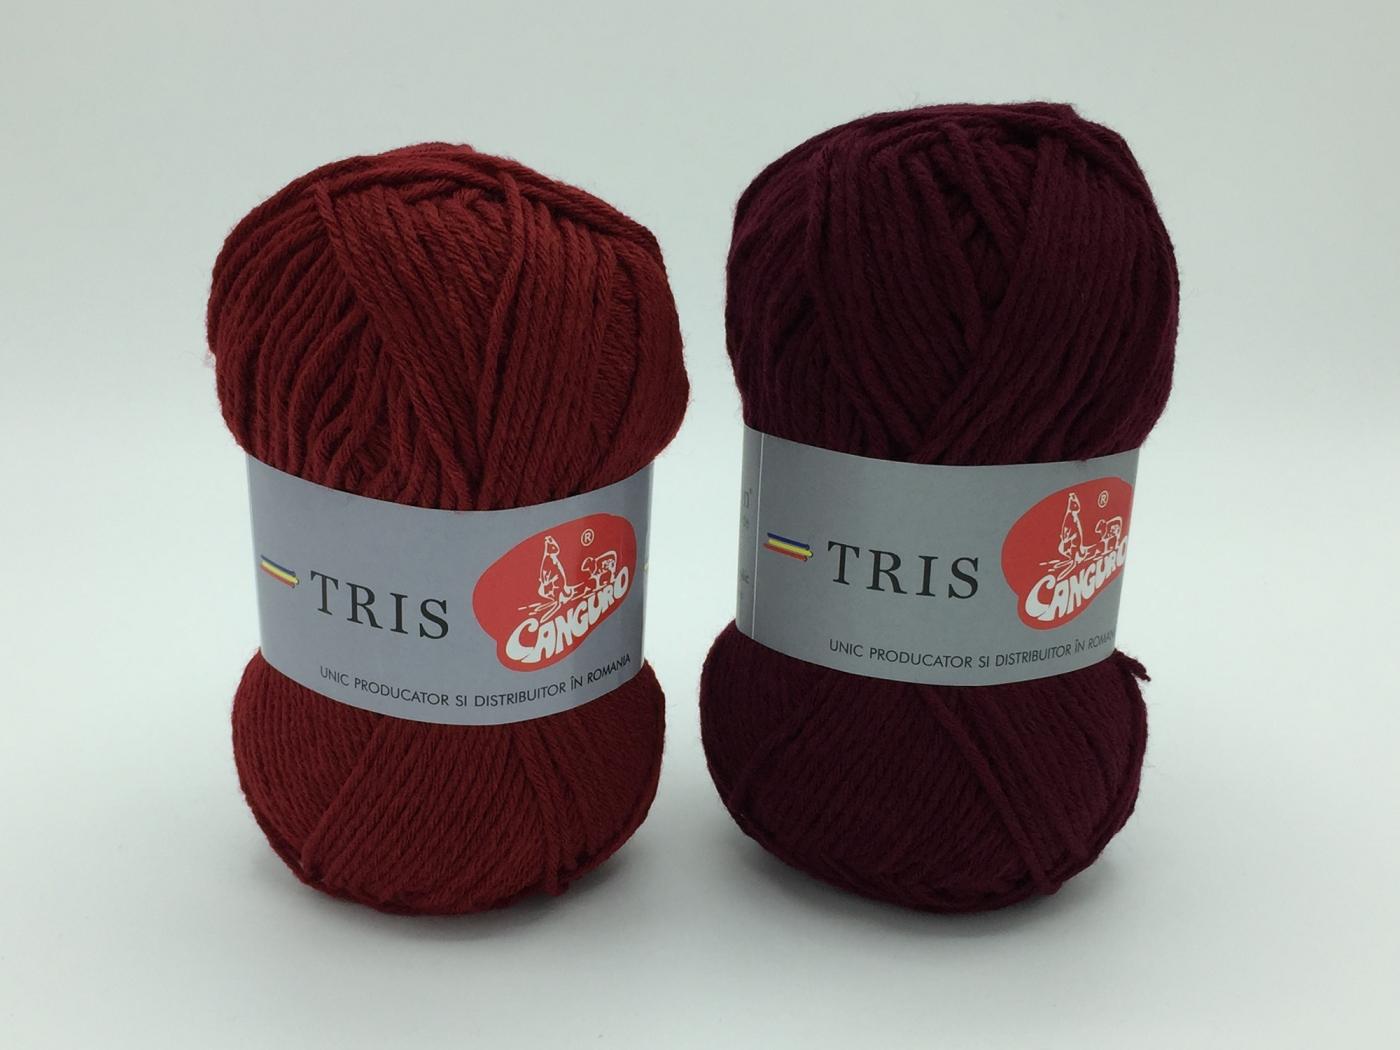 Fire tricotat Tris - Bordo - Canguro